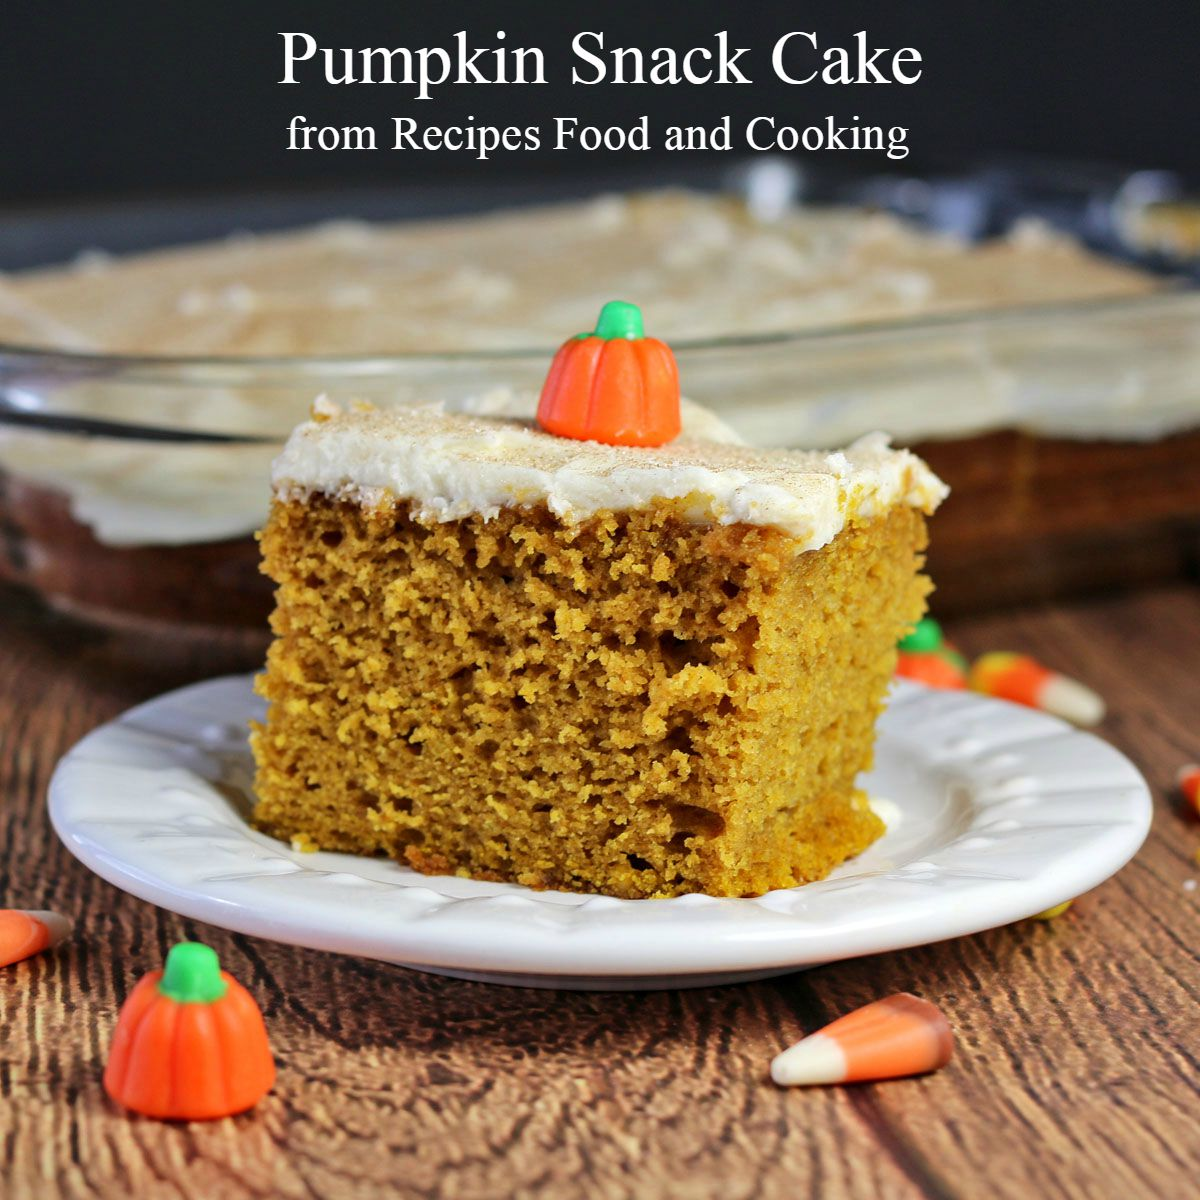 Pumpkin Snack Cake #PumpkinWeek - Recipes Food and Cooking